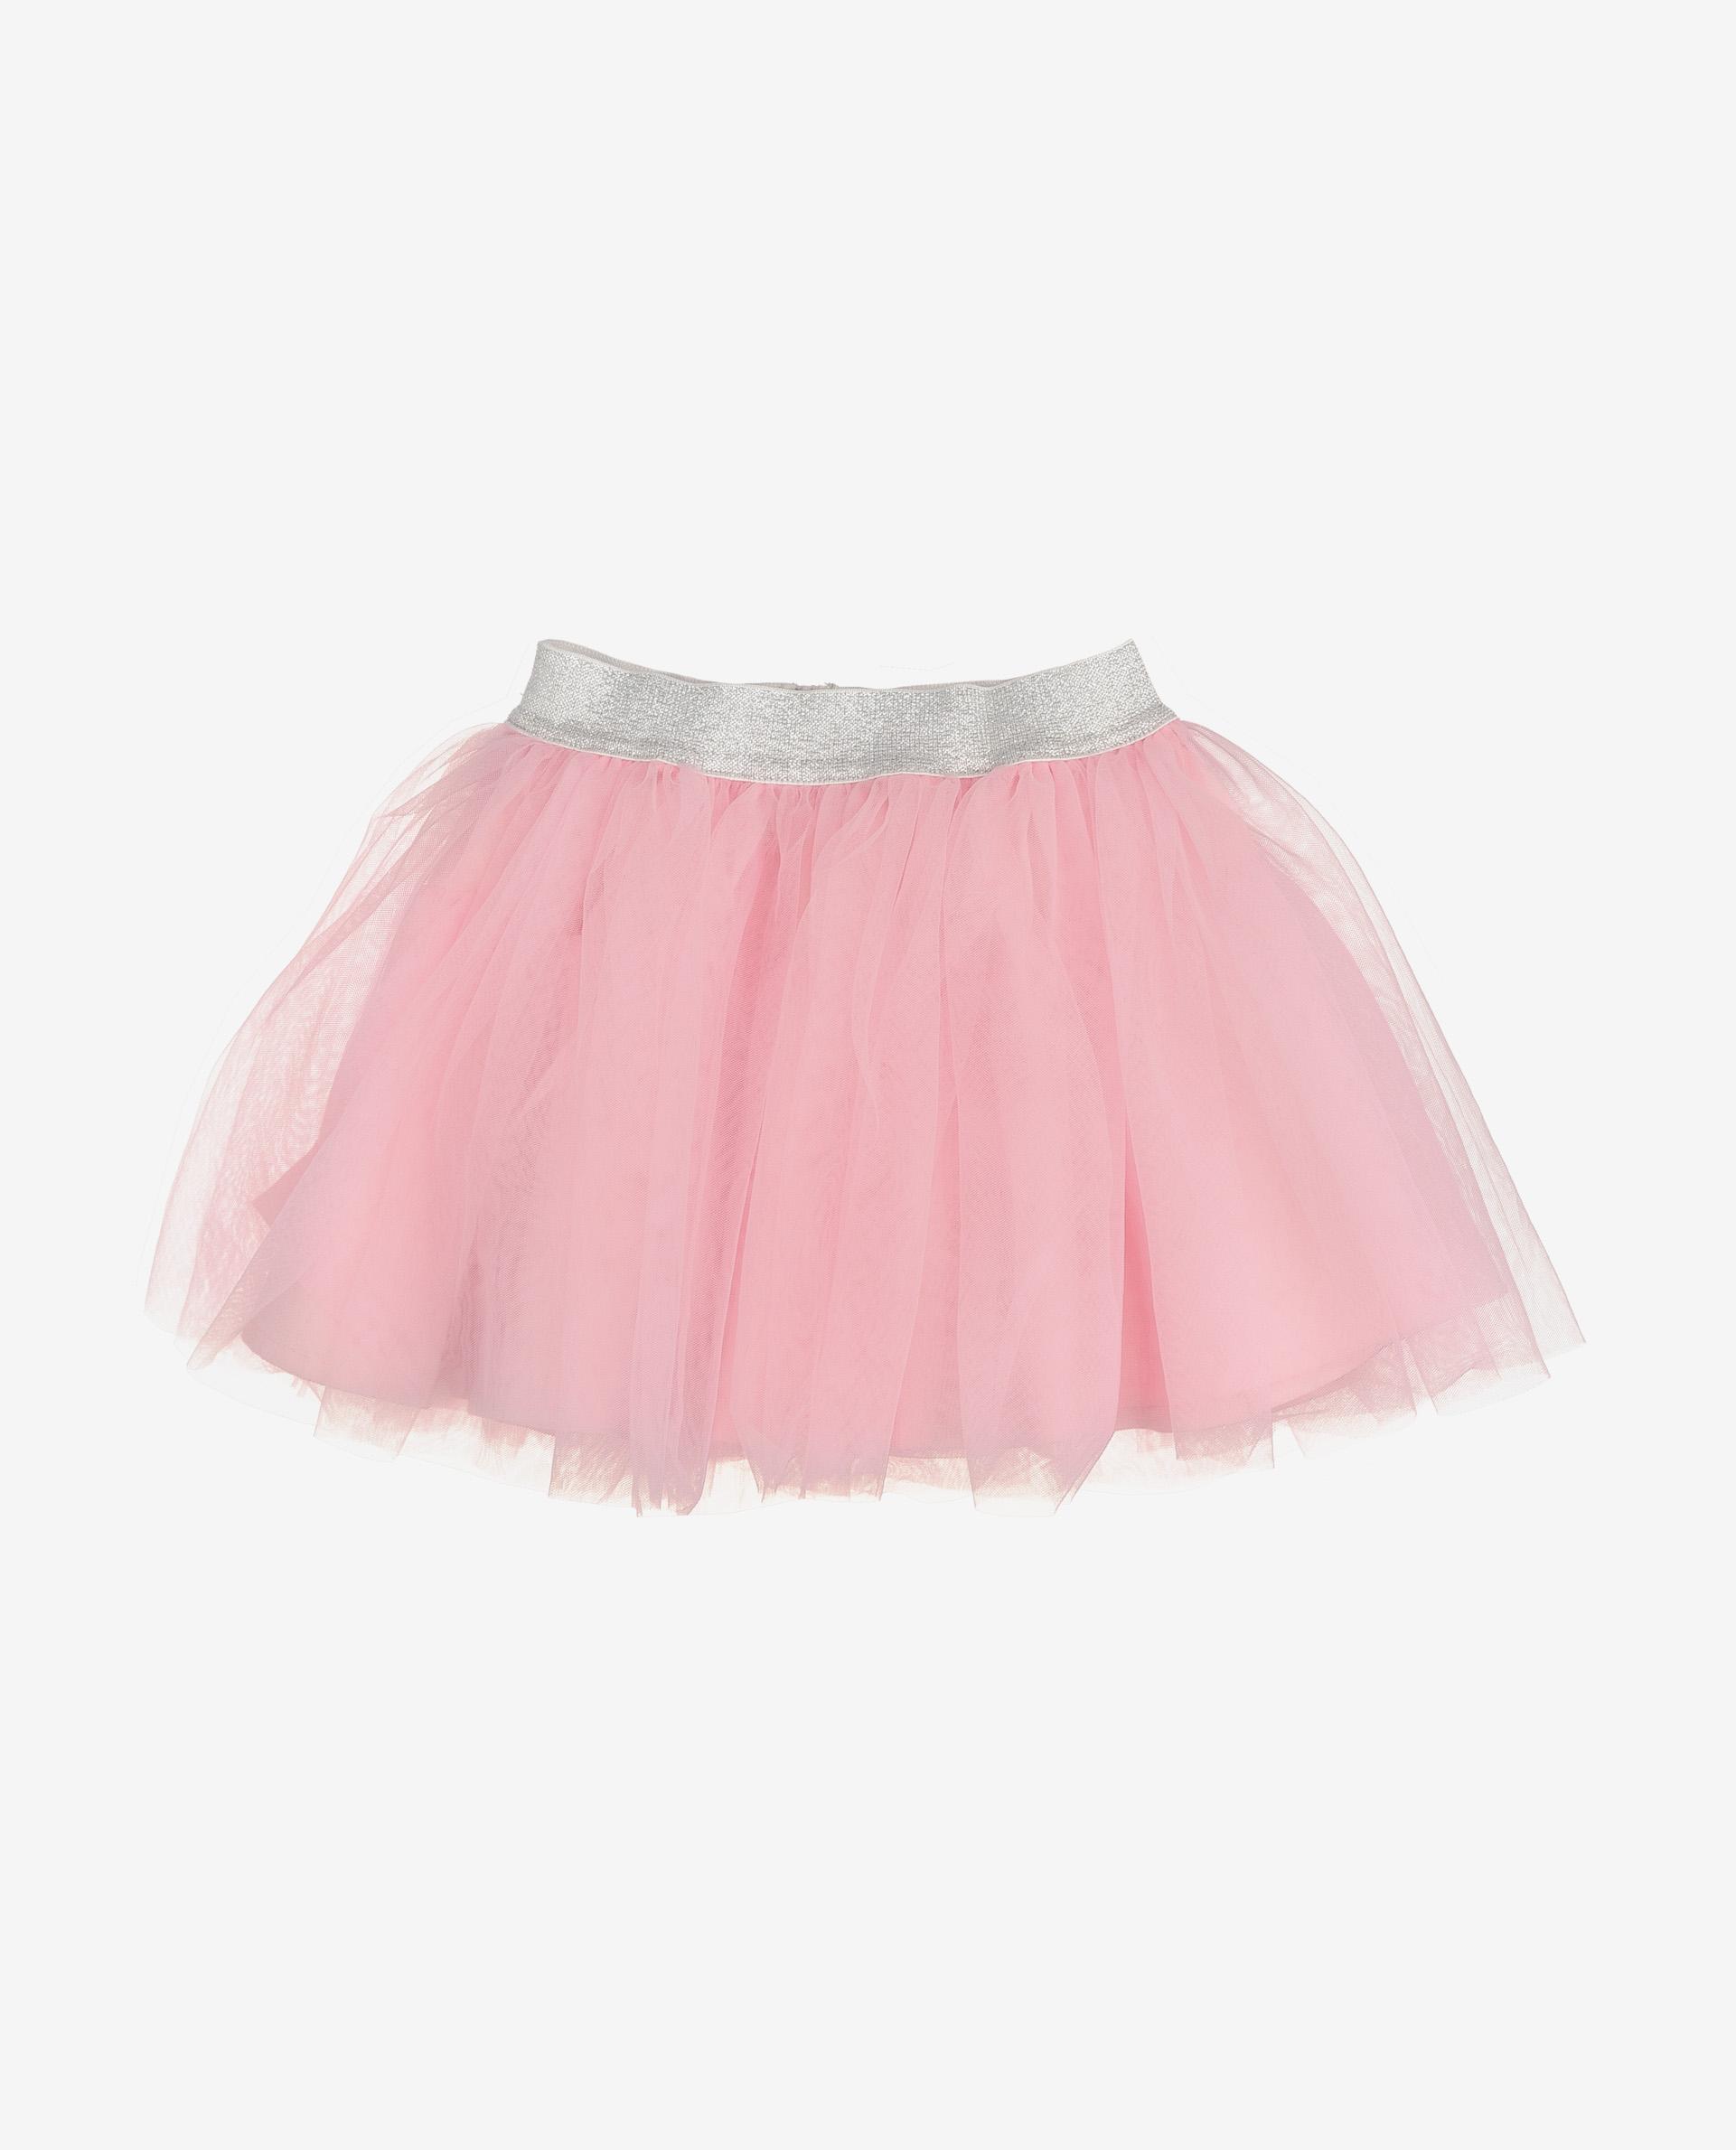 Купить 12031GBC6101, Розовая юбка Gulliver, Gulliver Baby, розовый, 92, Женский, ВЕСНА/ЛЕТО 2020 (shop: GulliverMarket Gulliver Market)